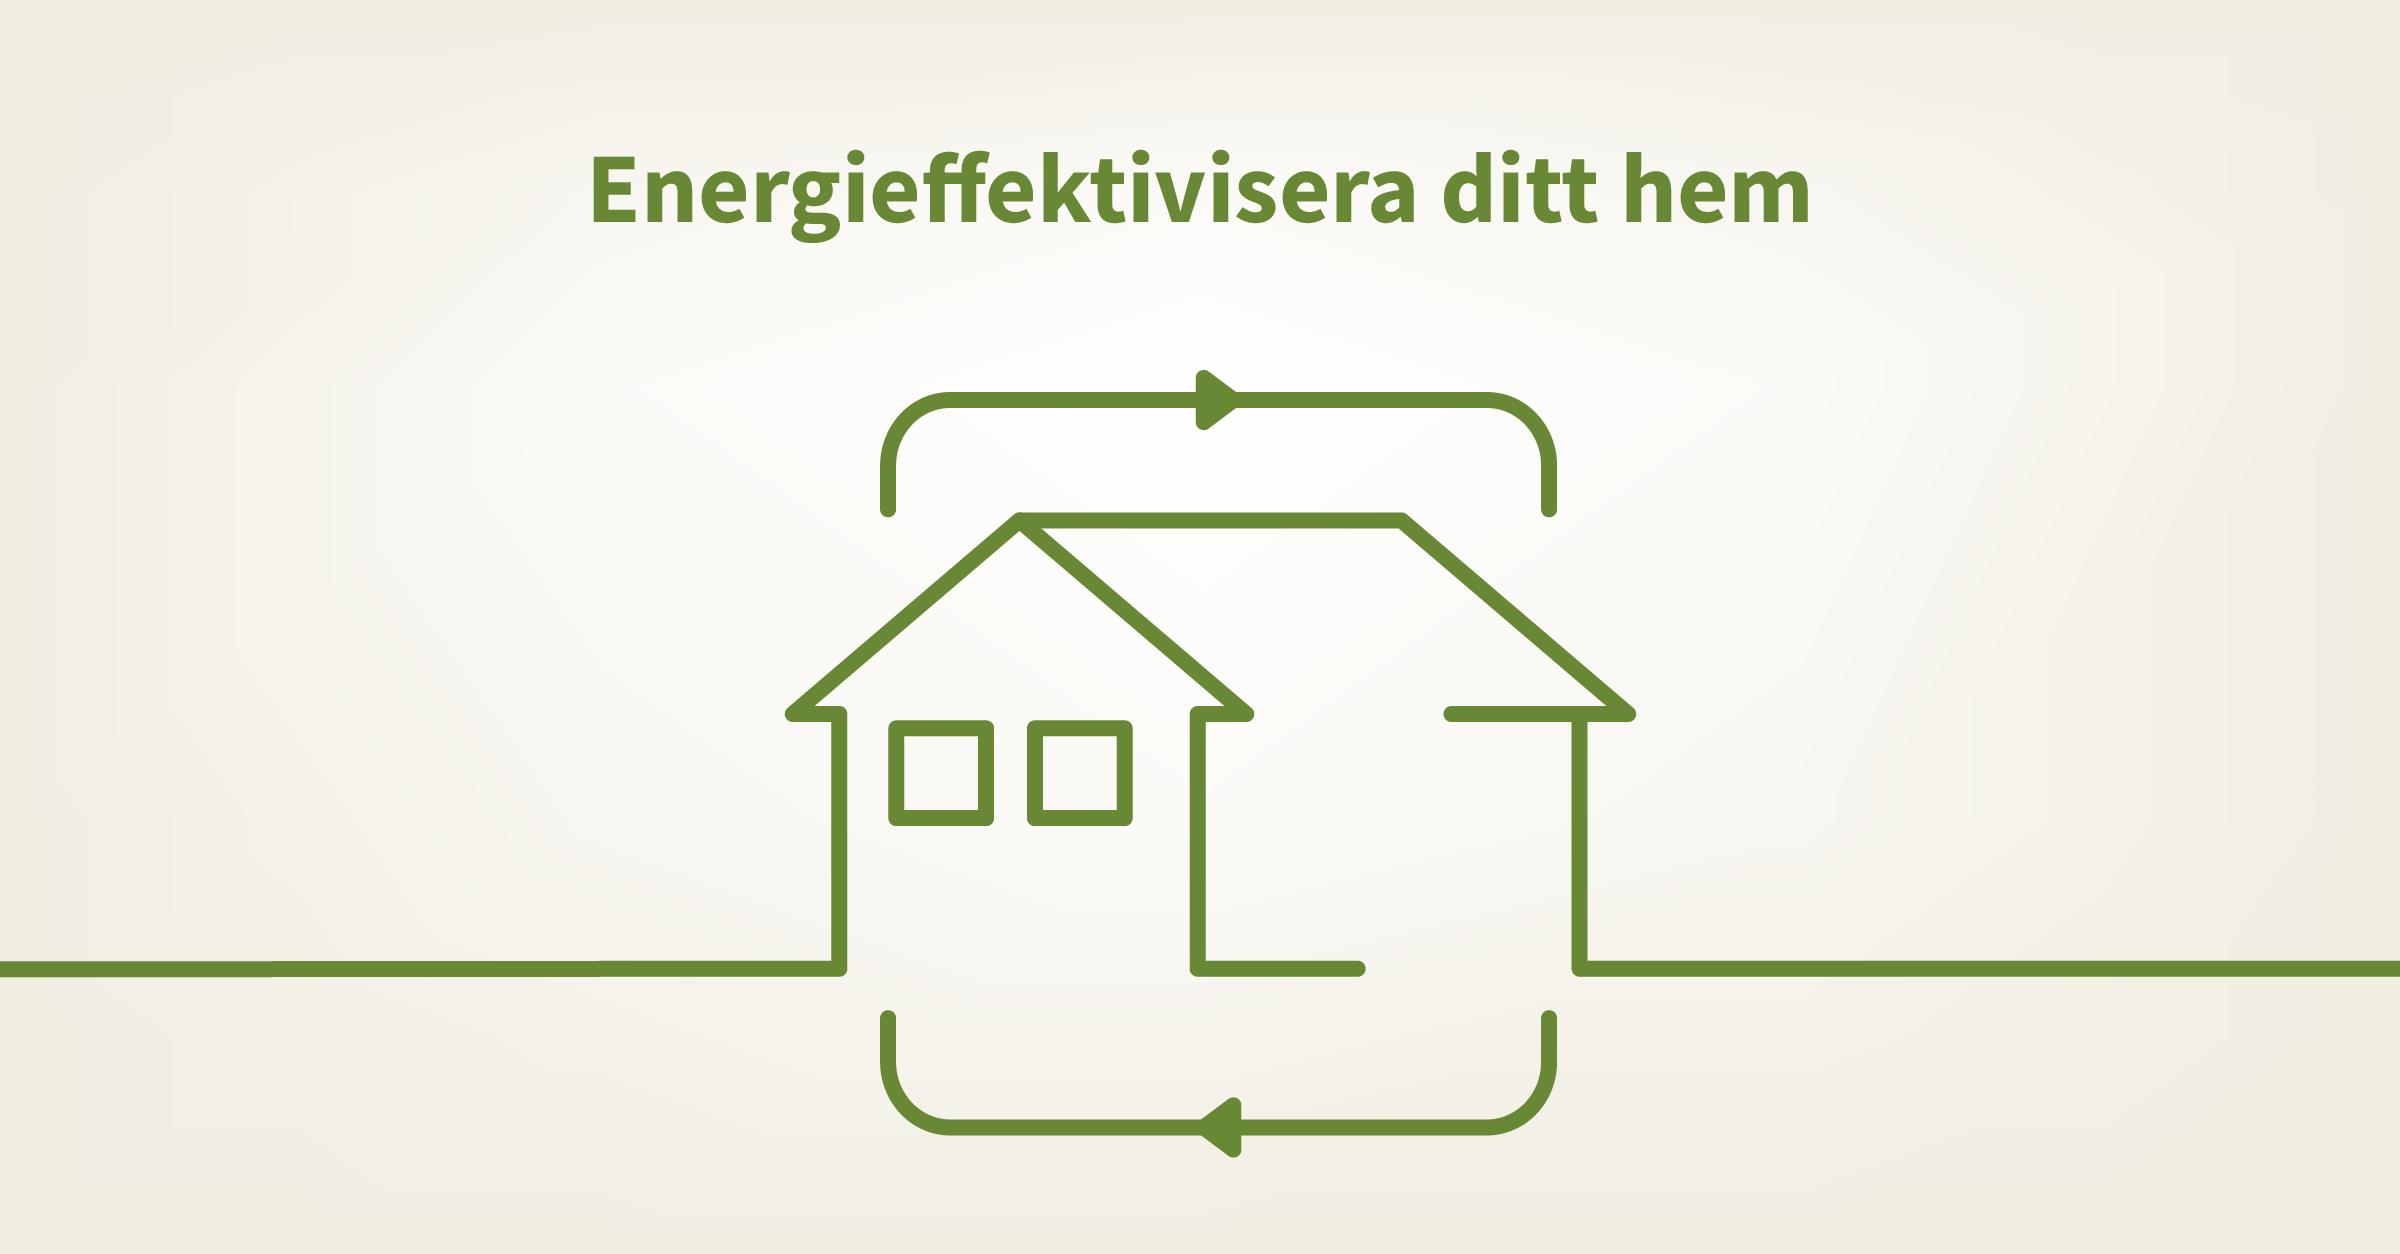 Energieffektivisera ditt hus